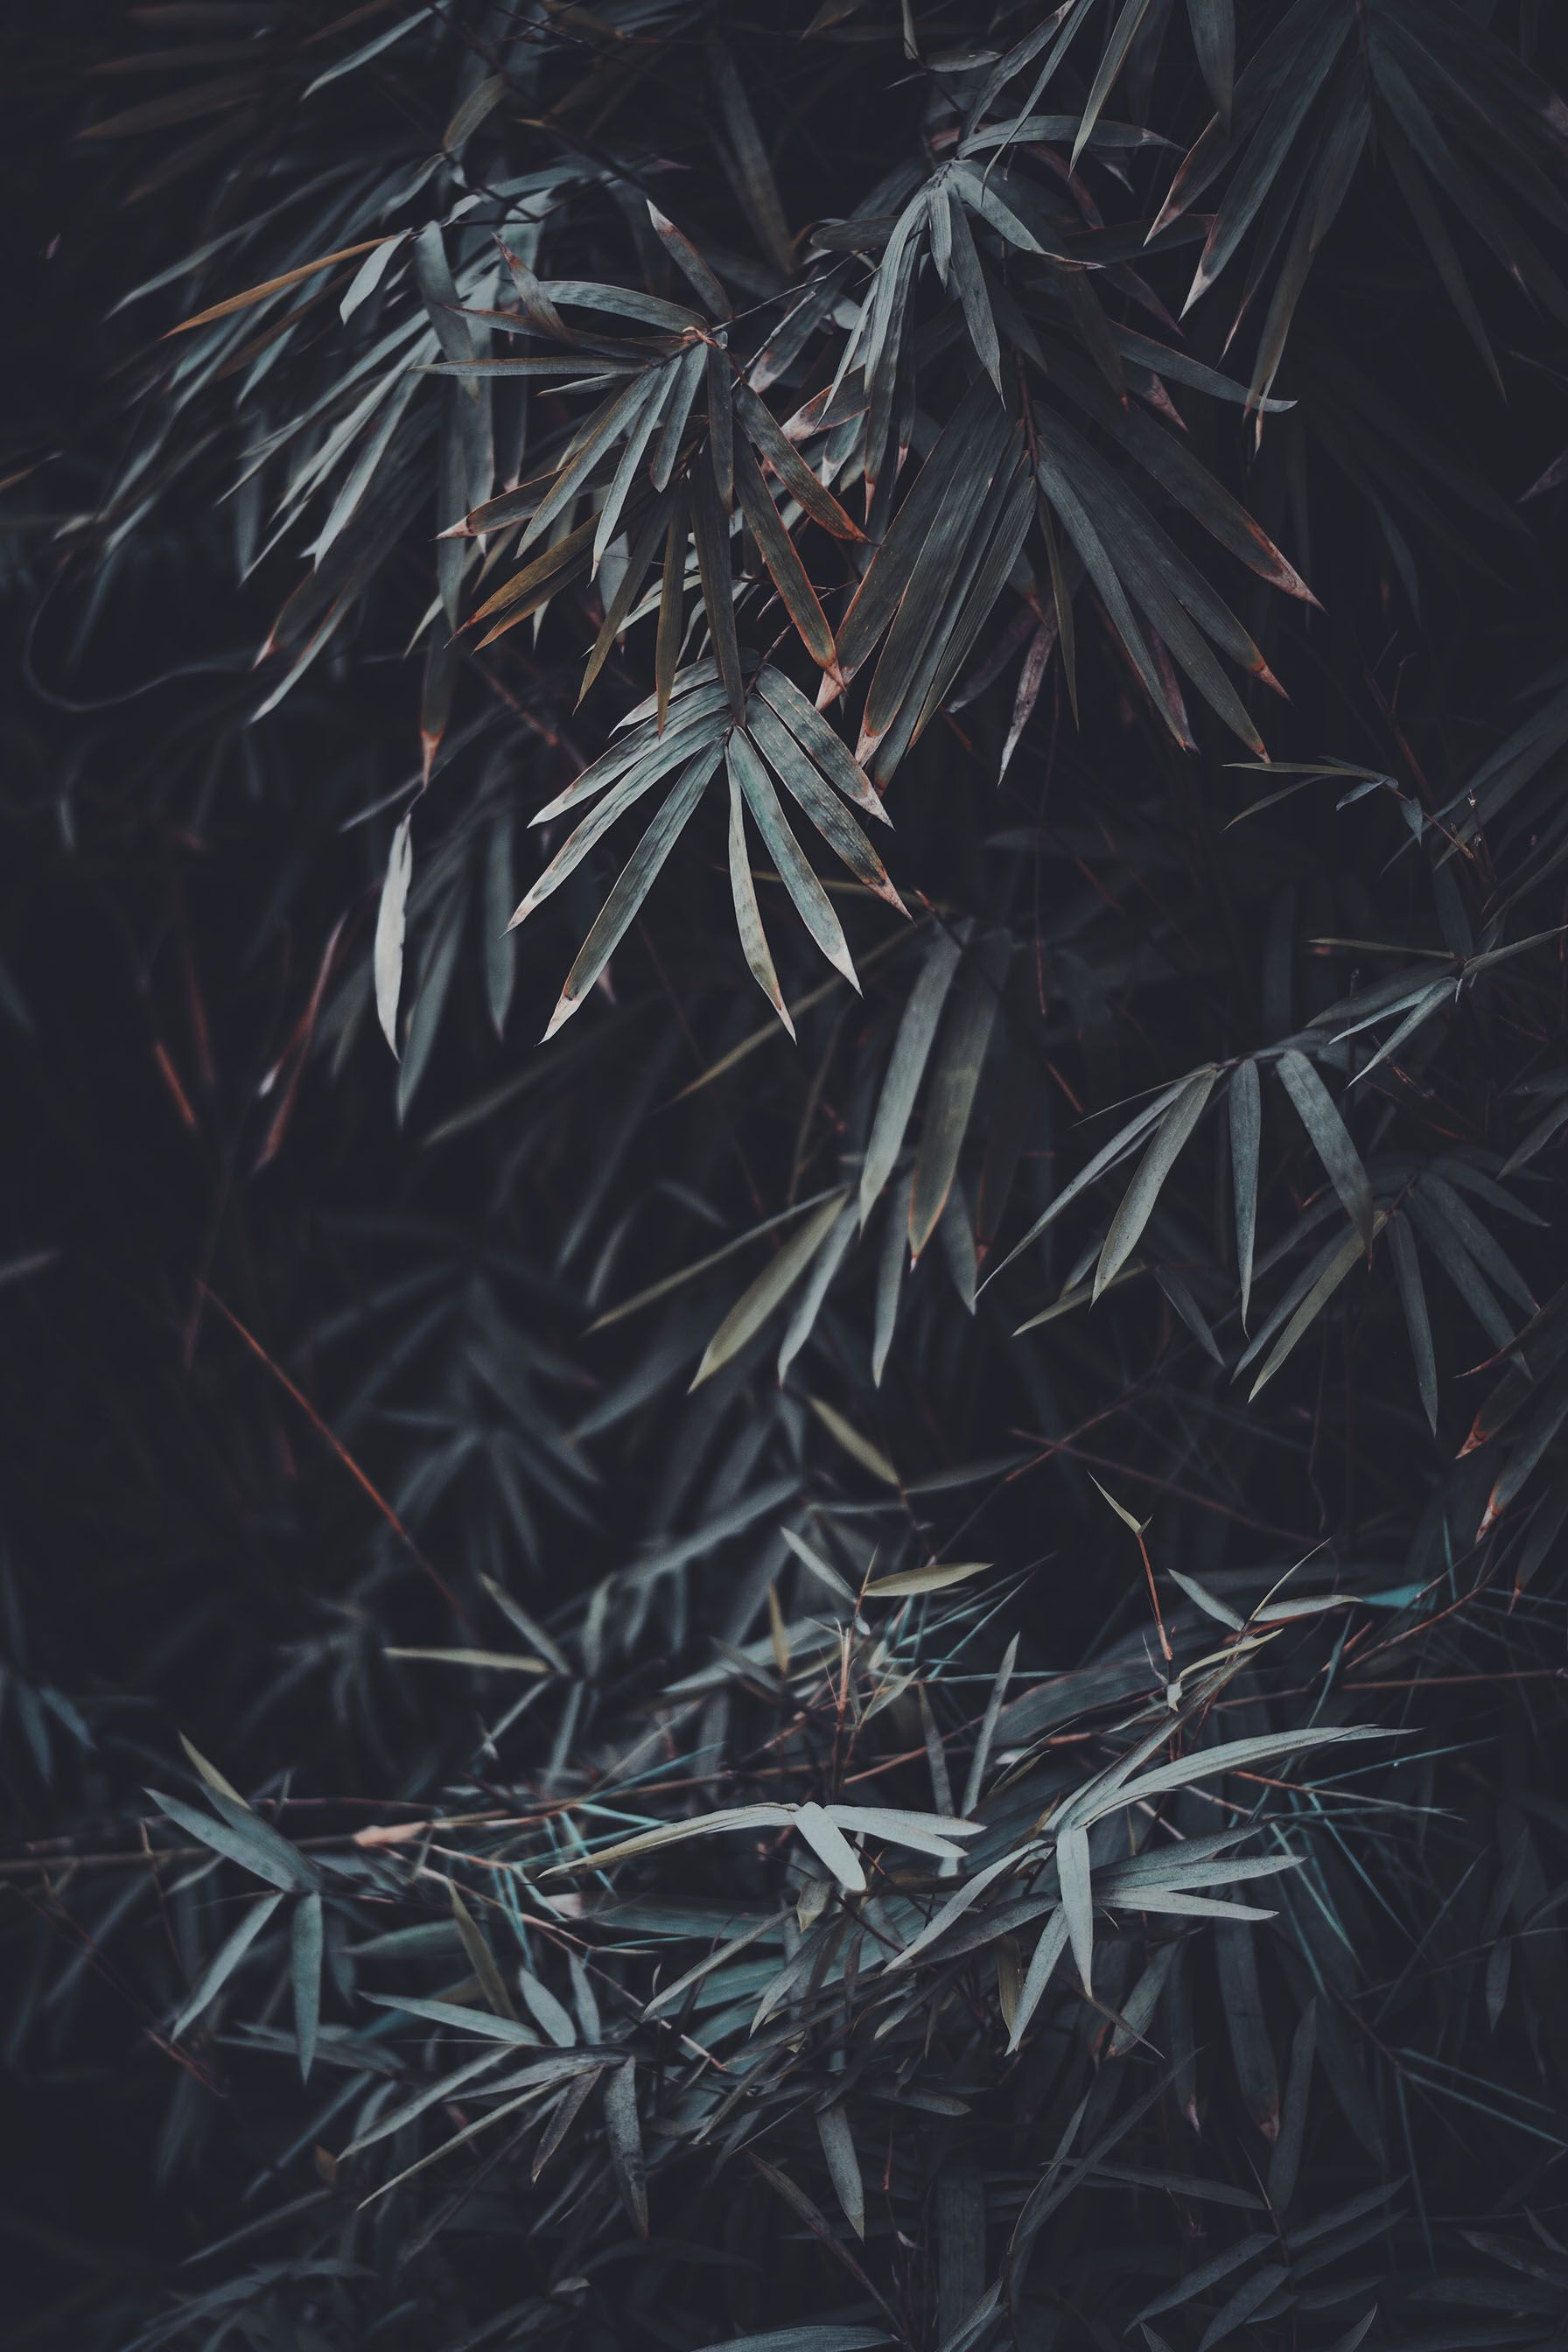 Best Dark Or Black Iphone Wallpapers Night Iphone Backgrounds Free Download Objek Gambar Wallpaper Hitam Lightroom